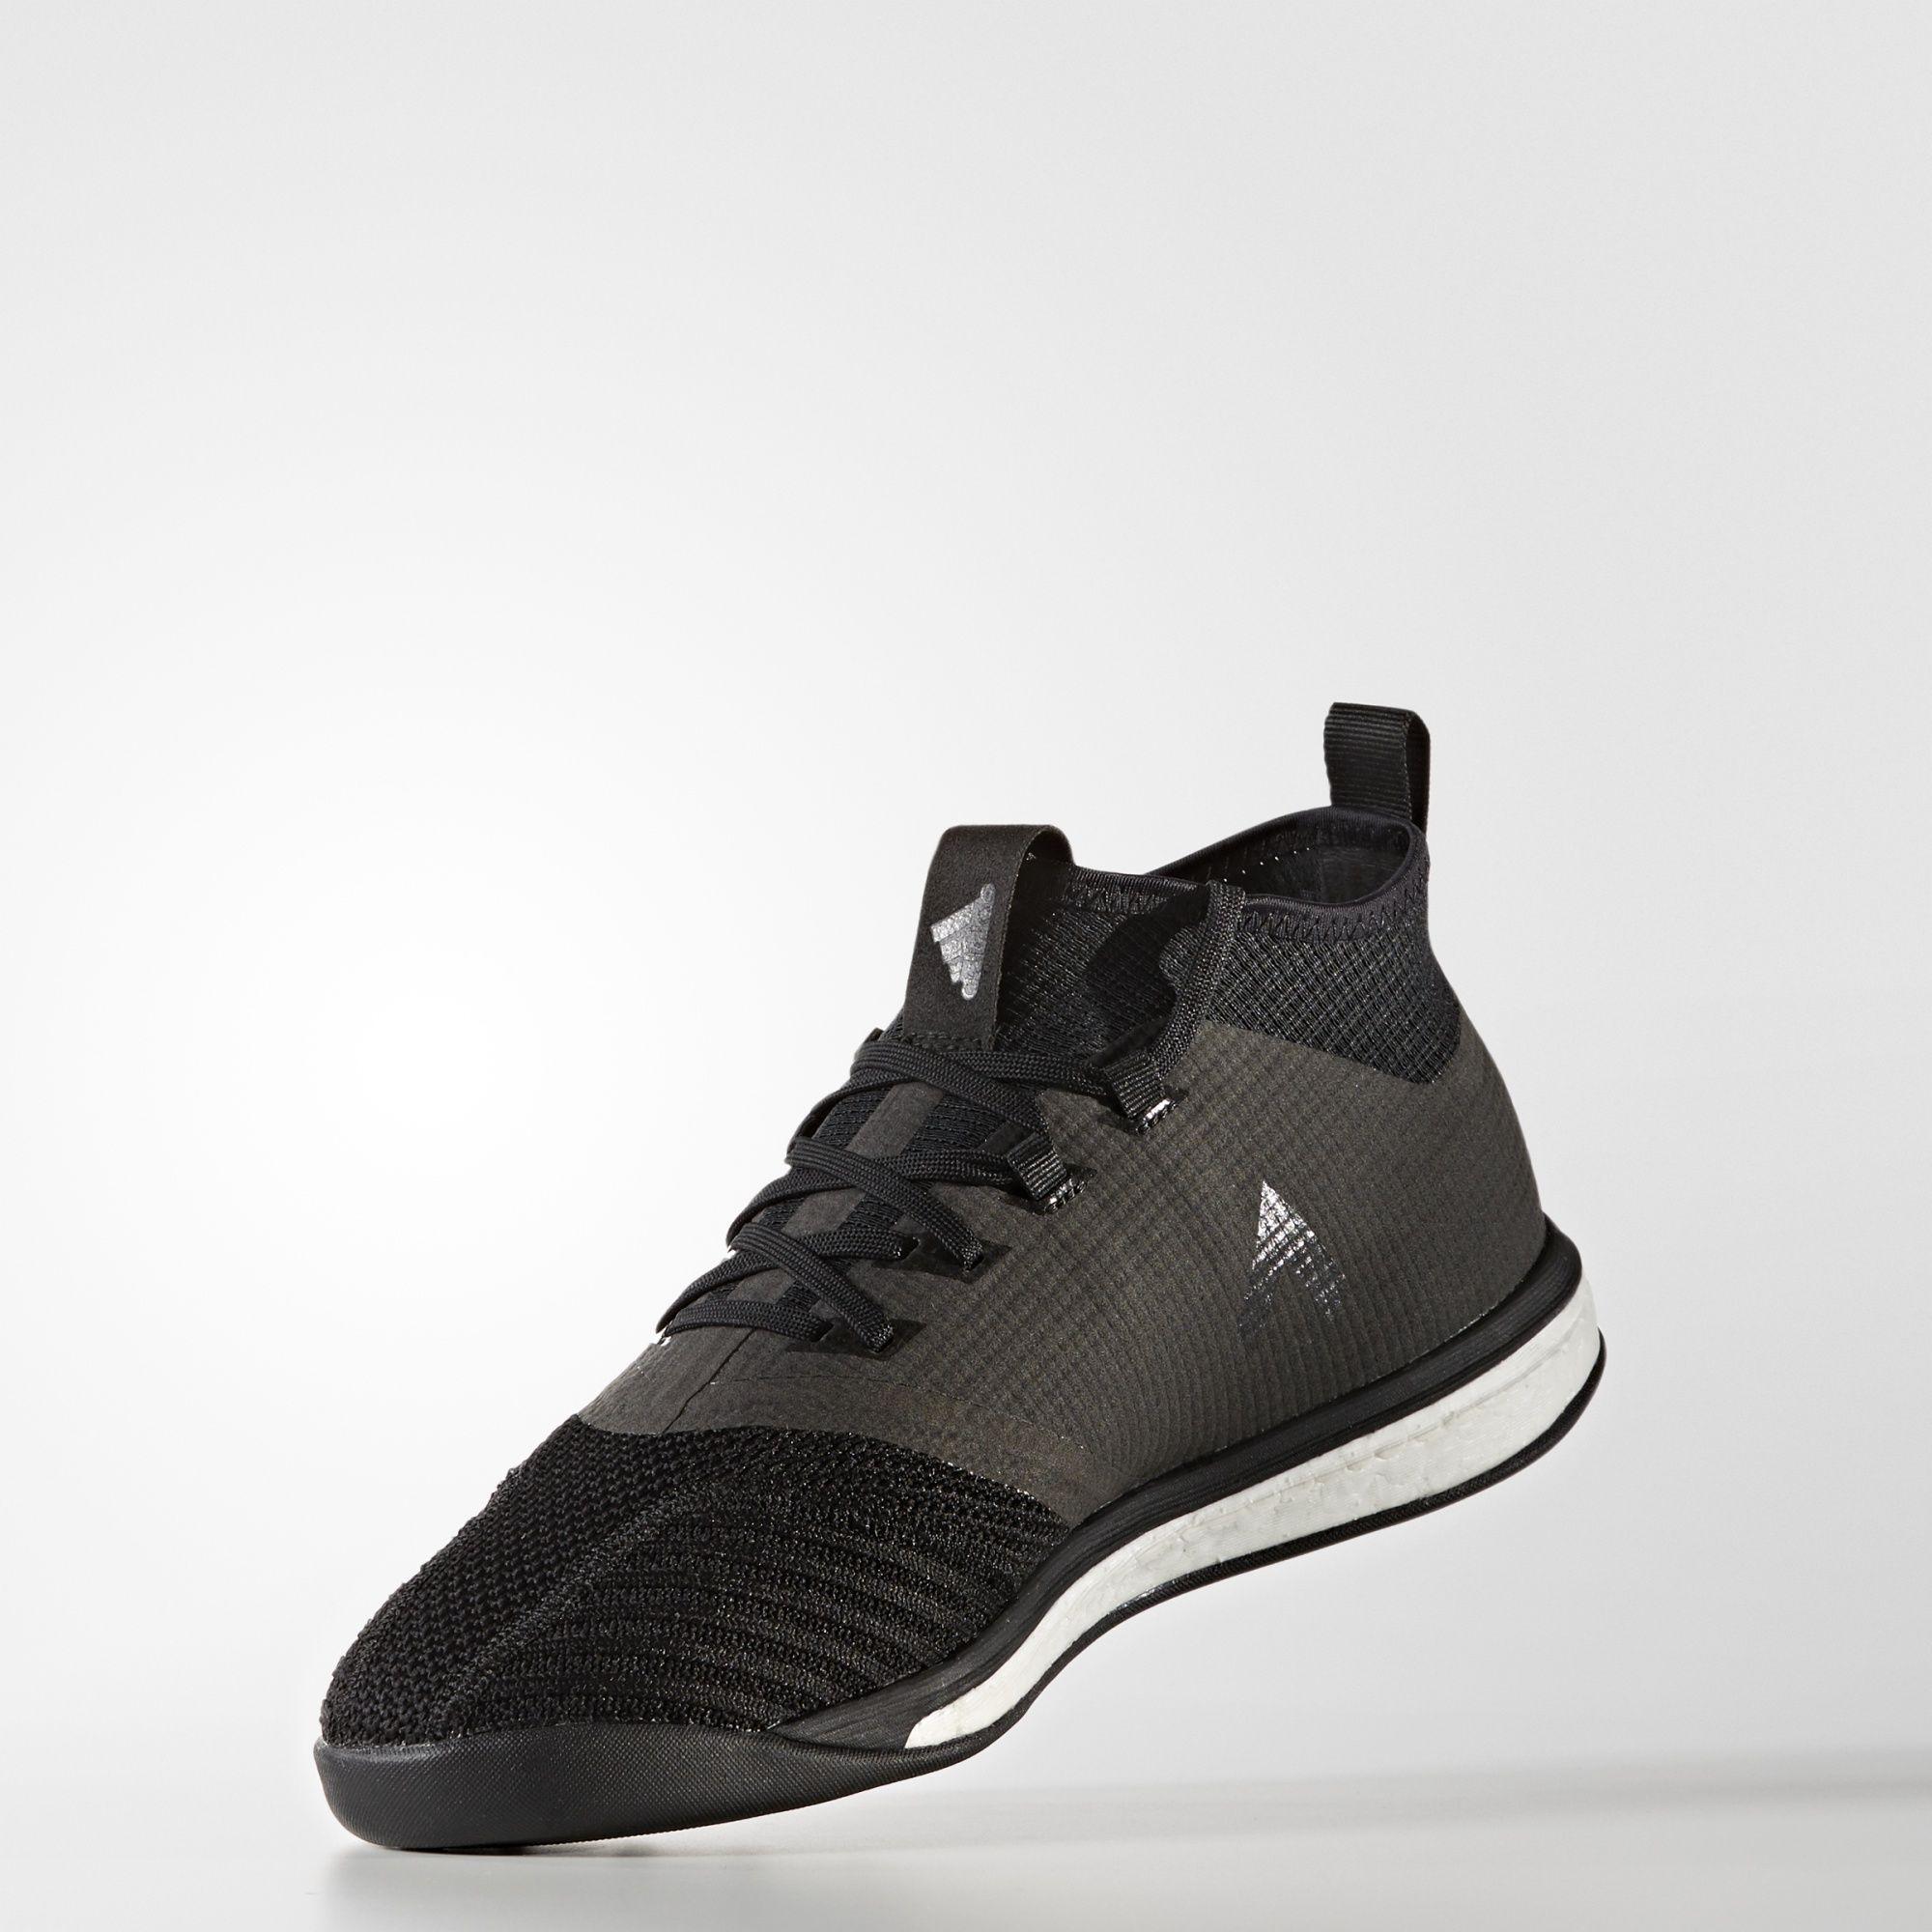 adidas ace tango 17 1 trainers core black equipment. Black Bedroom Furniture Sets. Home Design Ideas